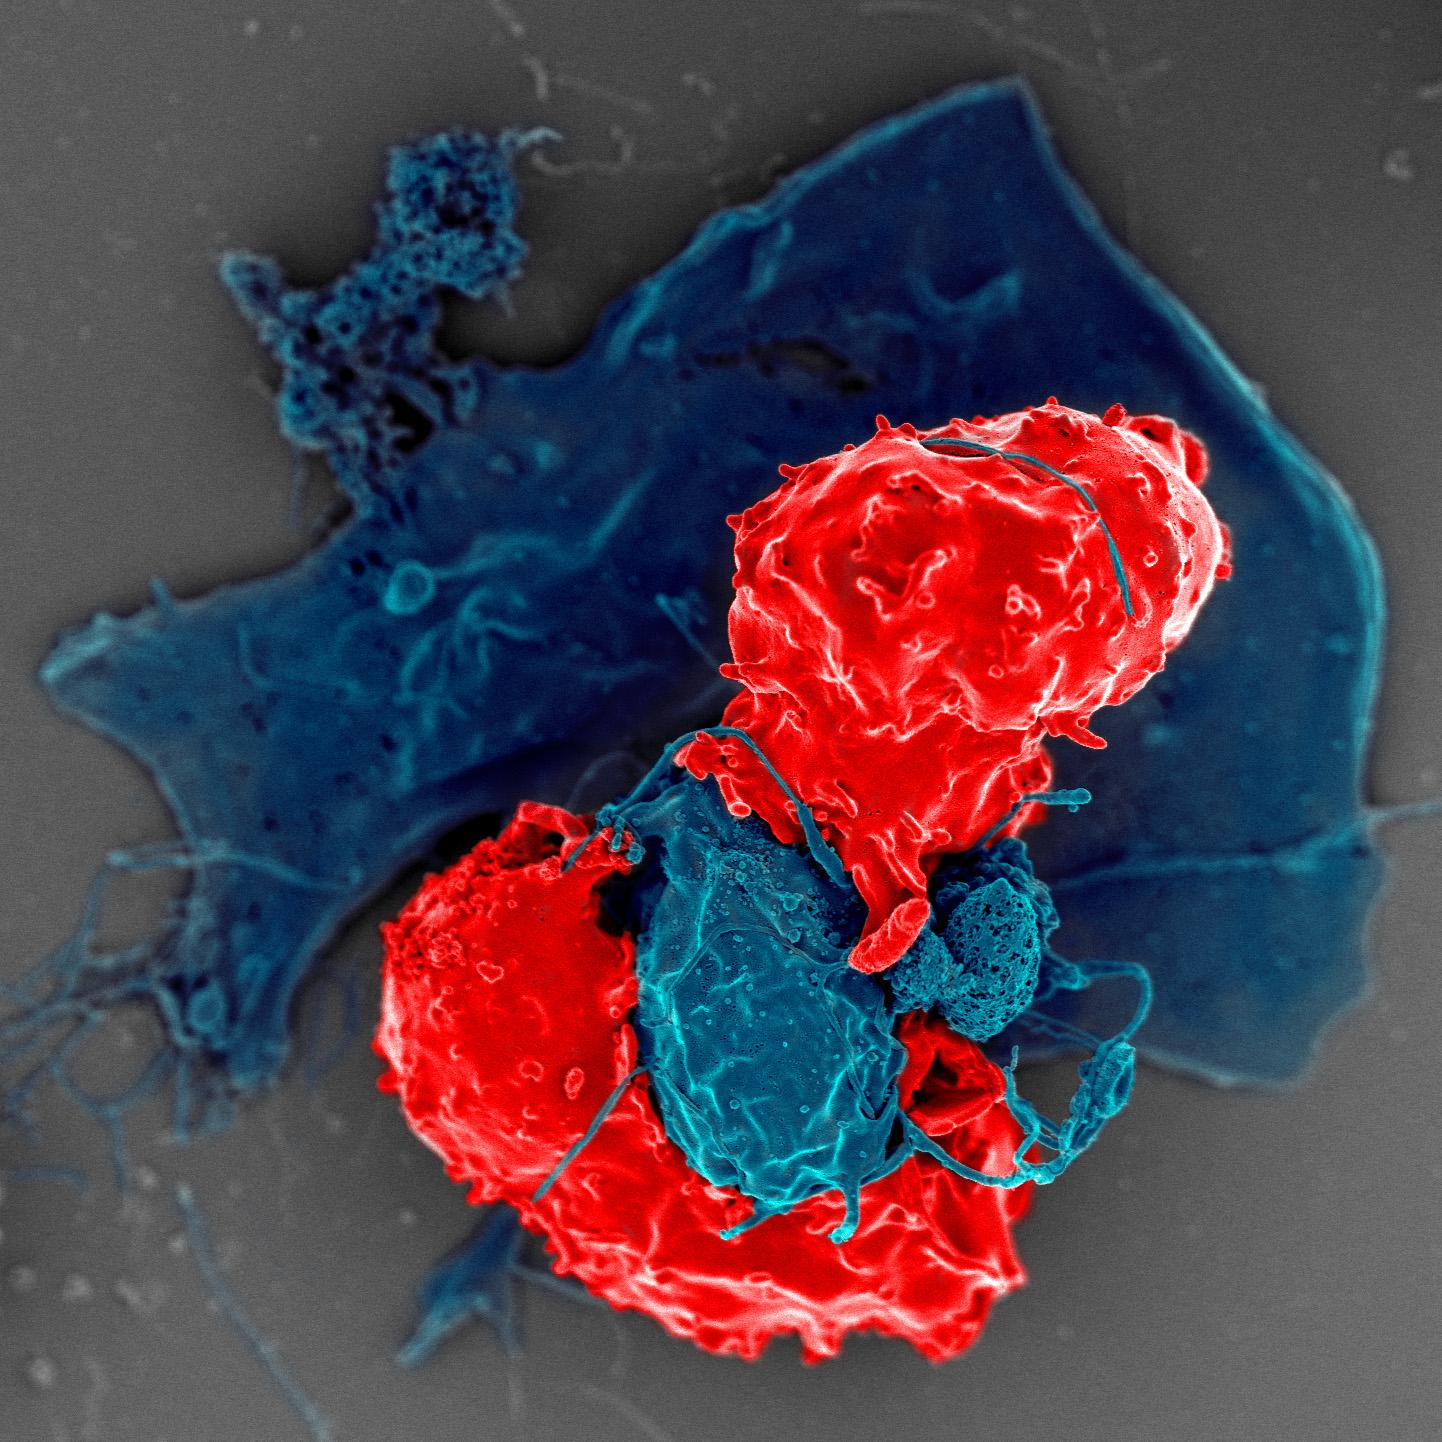 Мужской жир управляет иммунитетом по-мужски